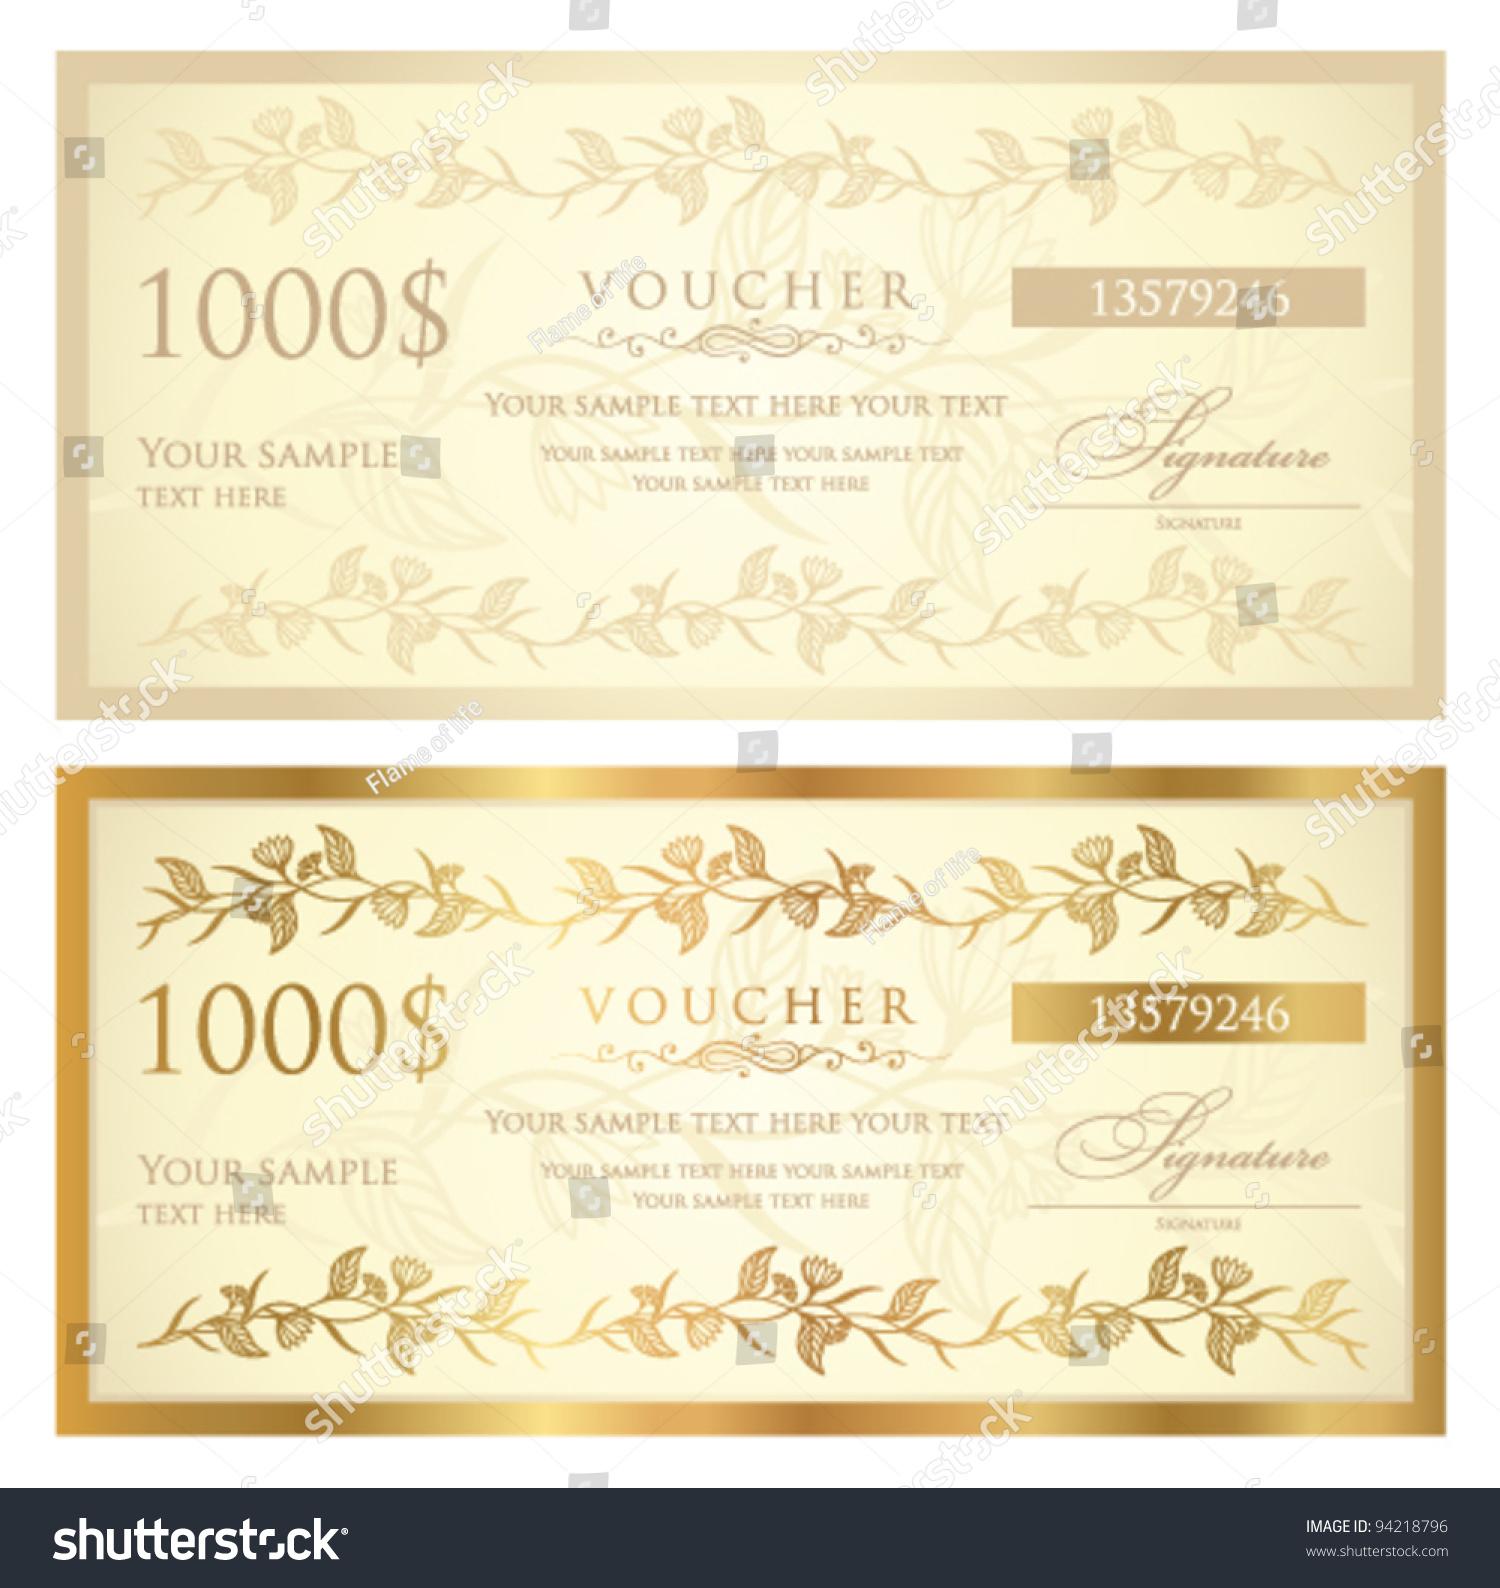 template for vouchers – Voucher Sample Design